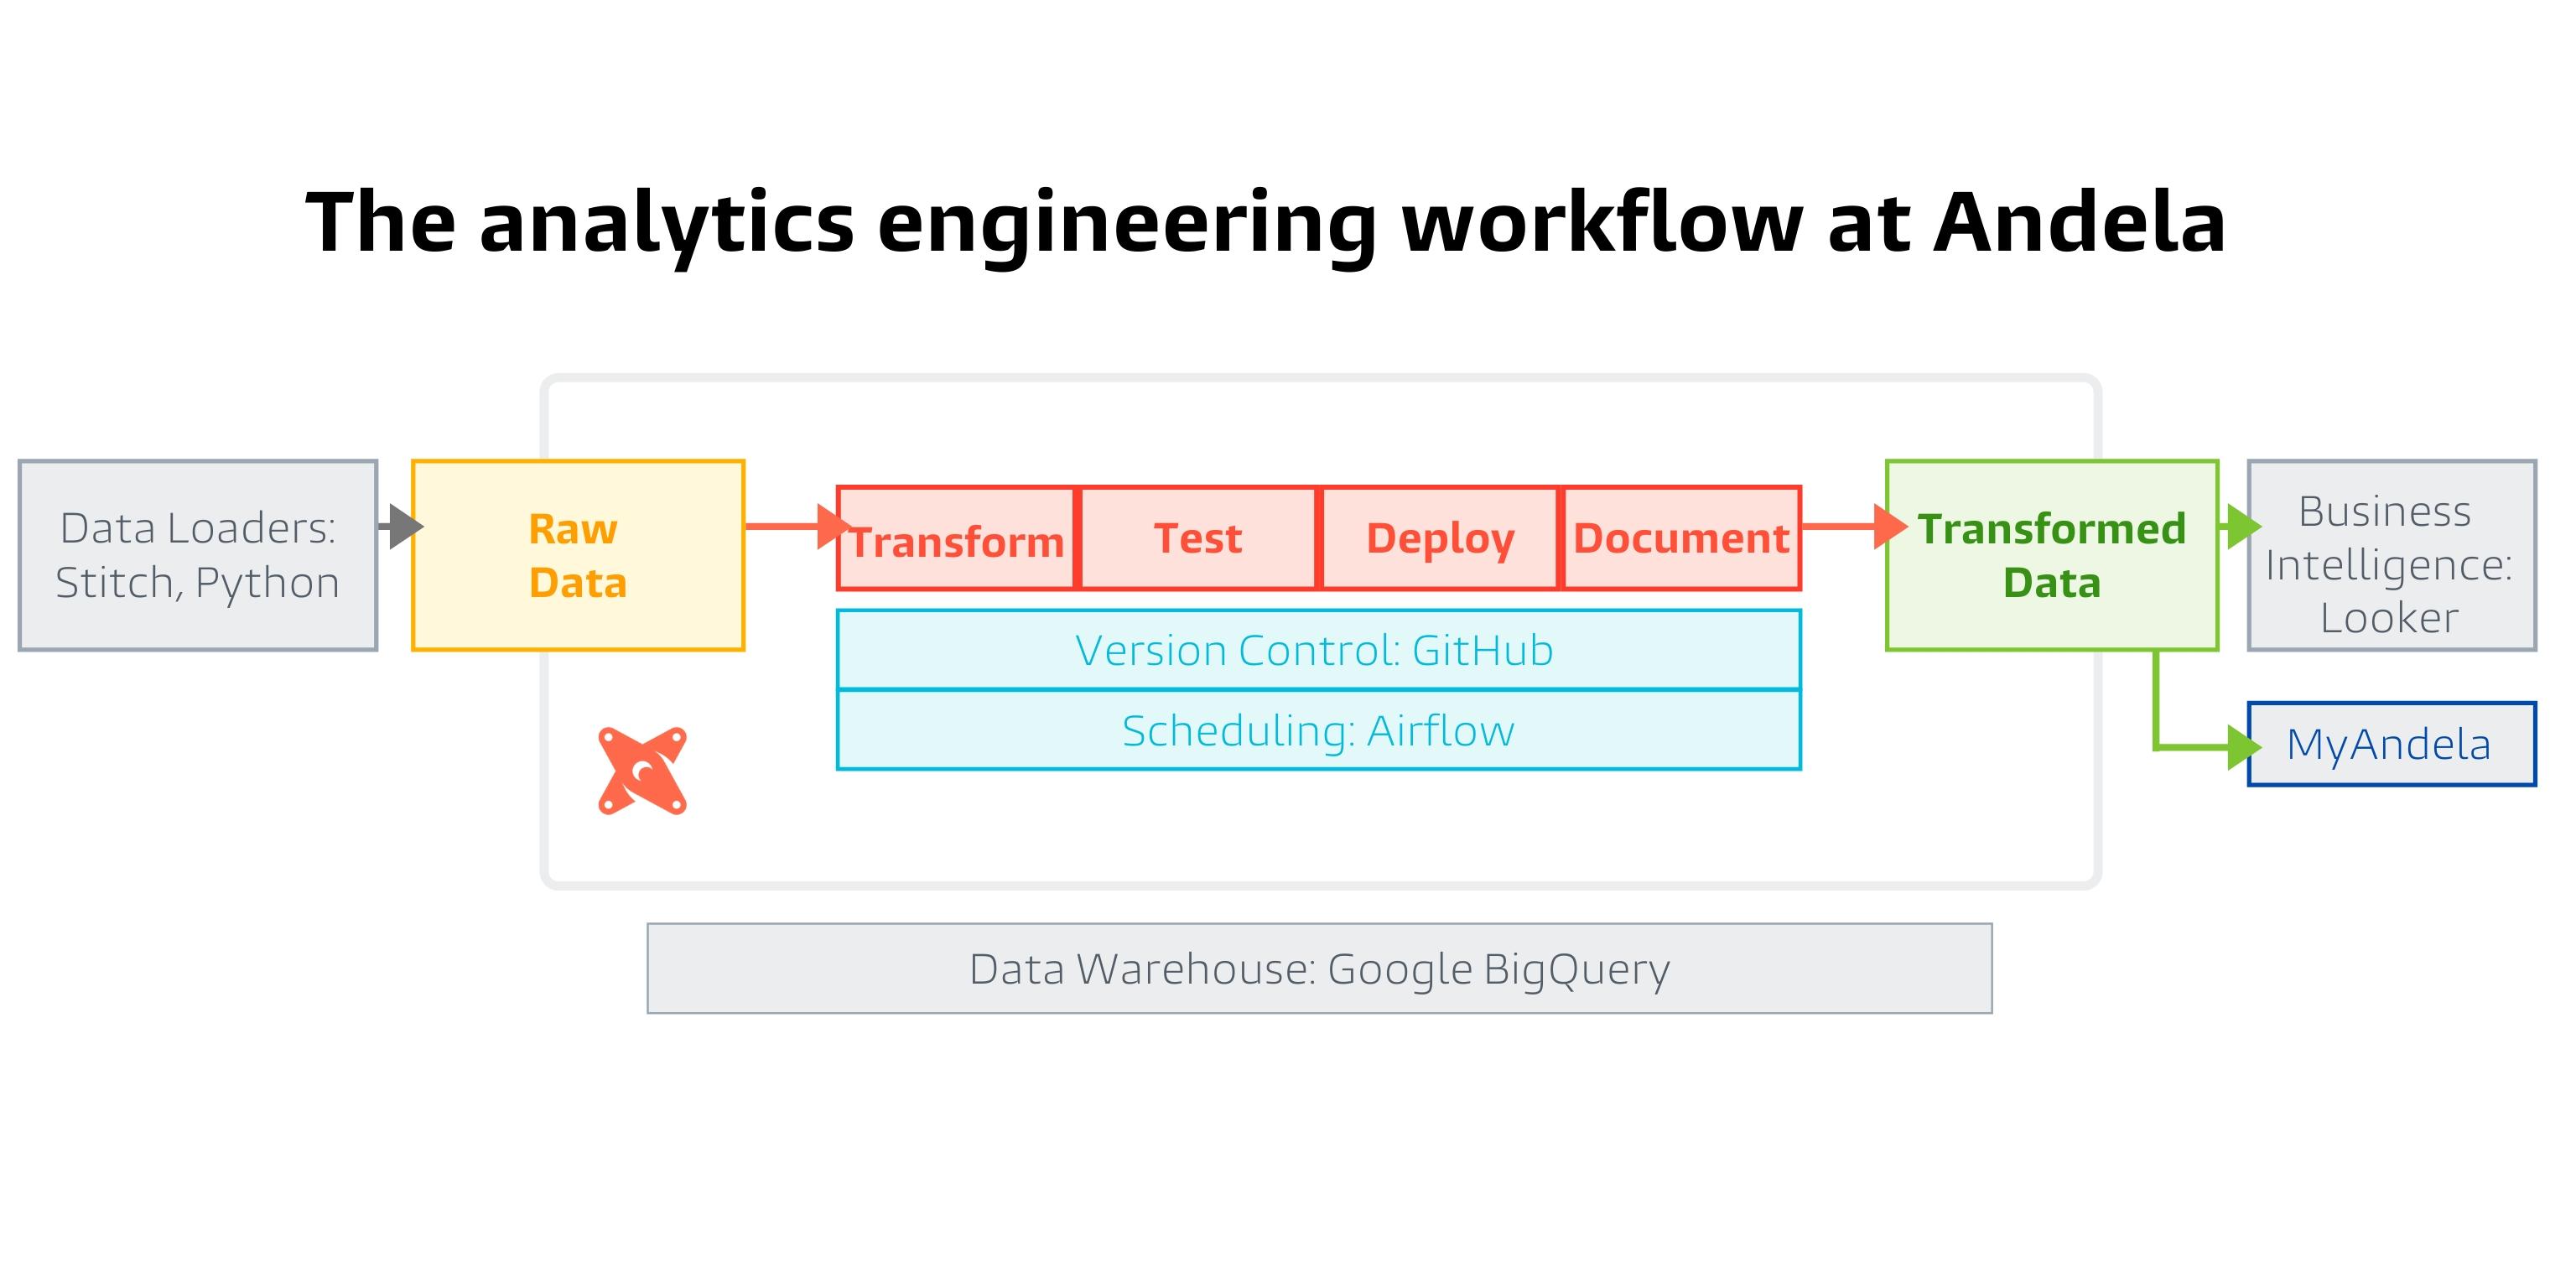 Andela analytics engineering Workflow